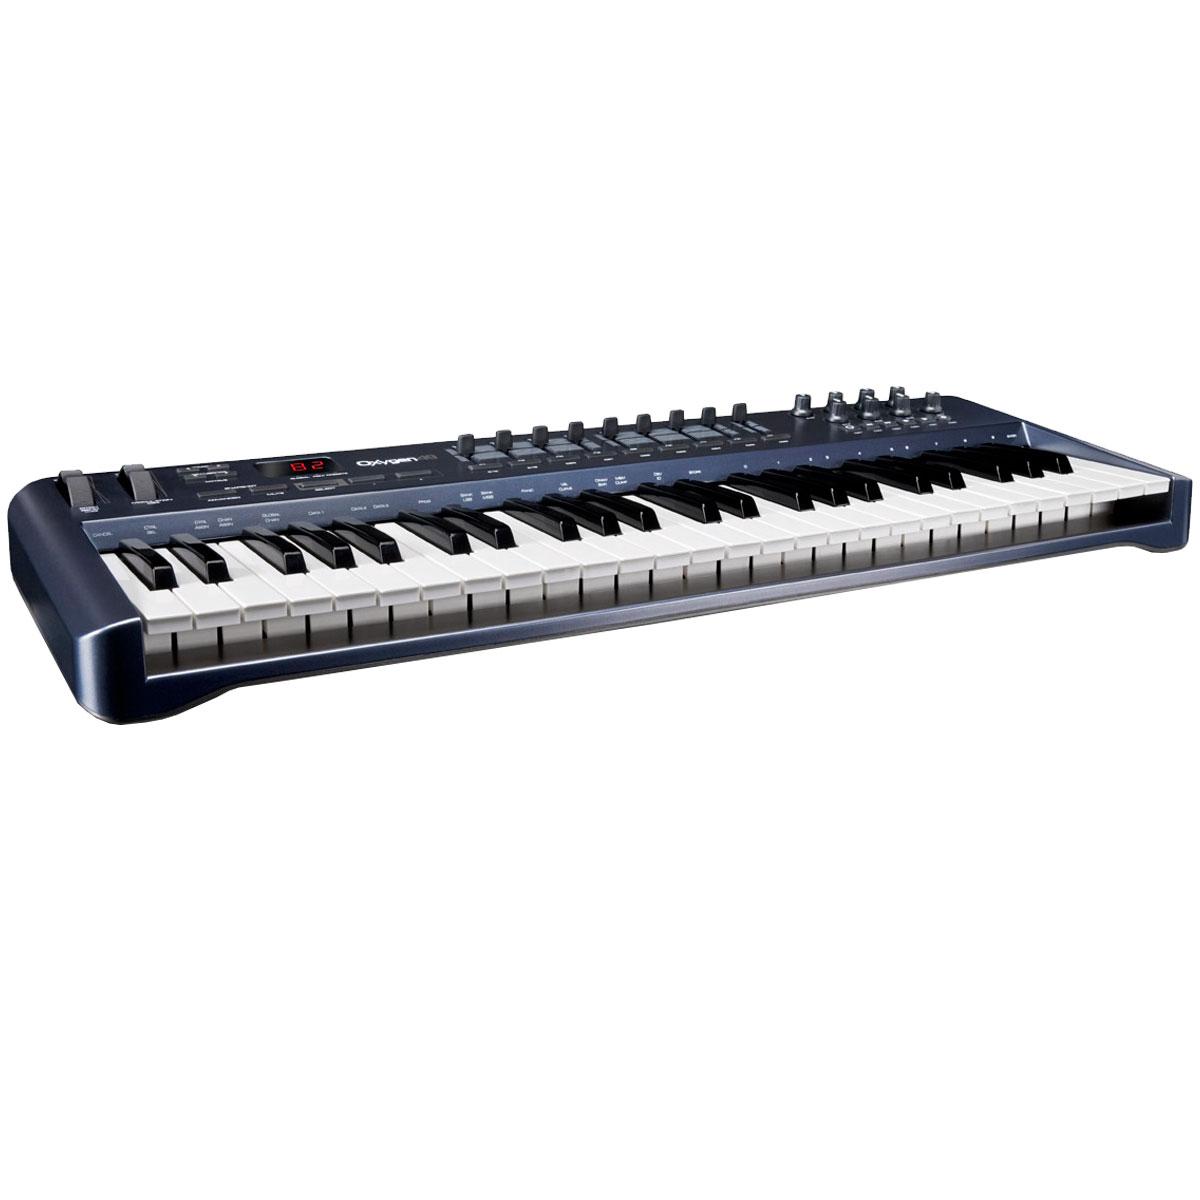 Teclado Controlador MIDI / USB Oxygen 49 - M-Audio